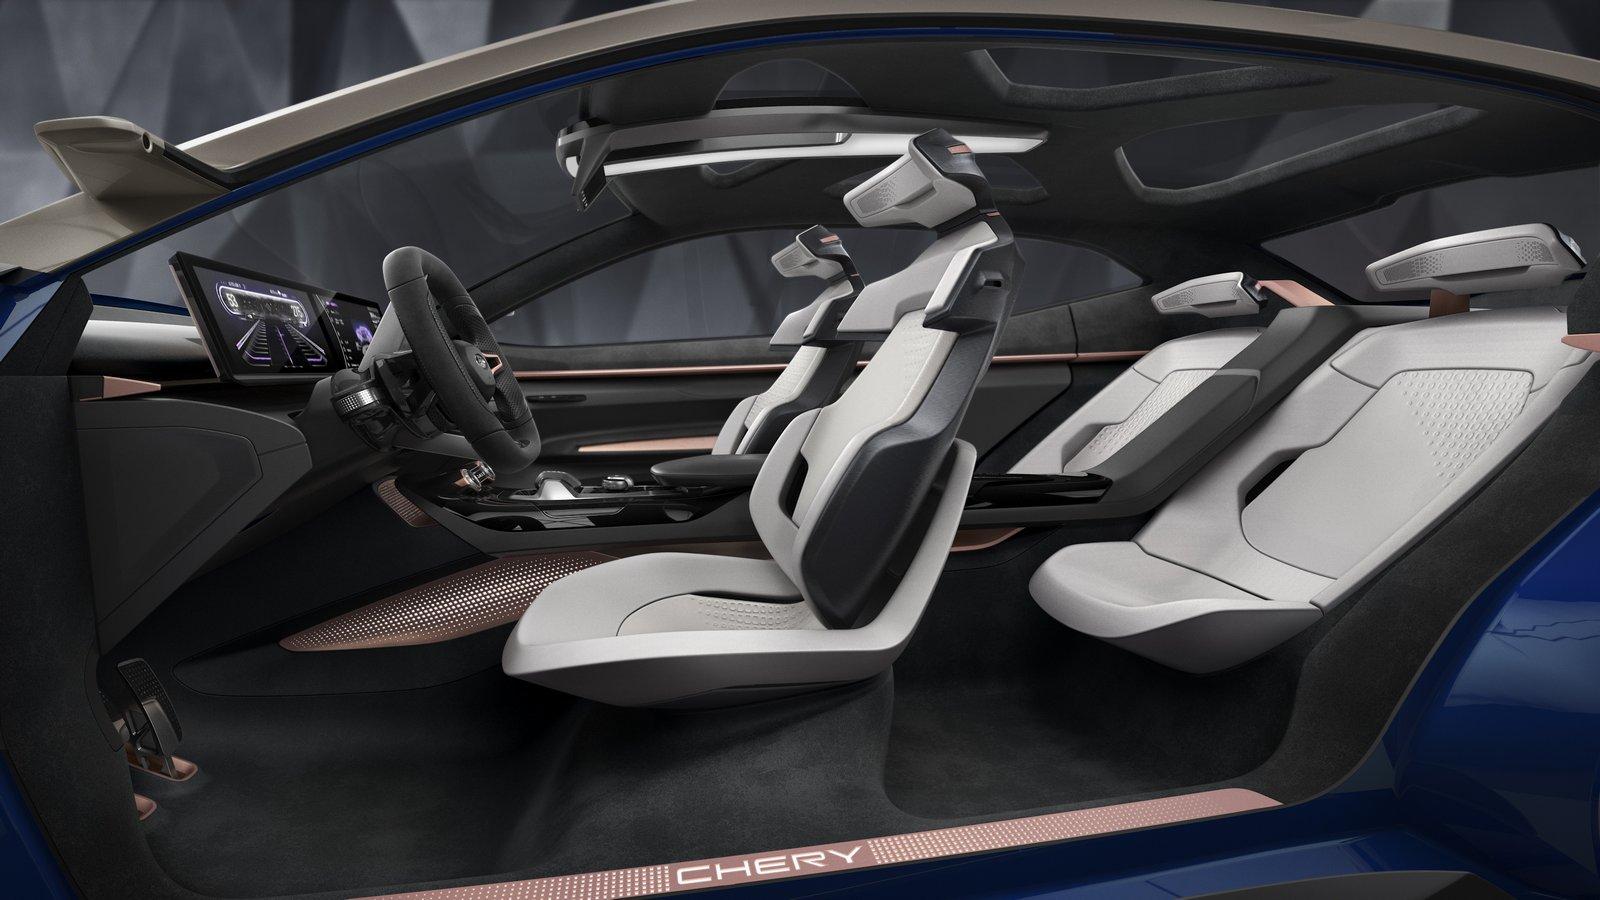 Chery-Tiggo-Sport-Coupe-Concept-1